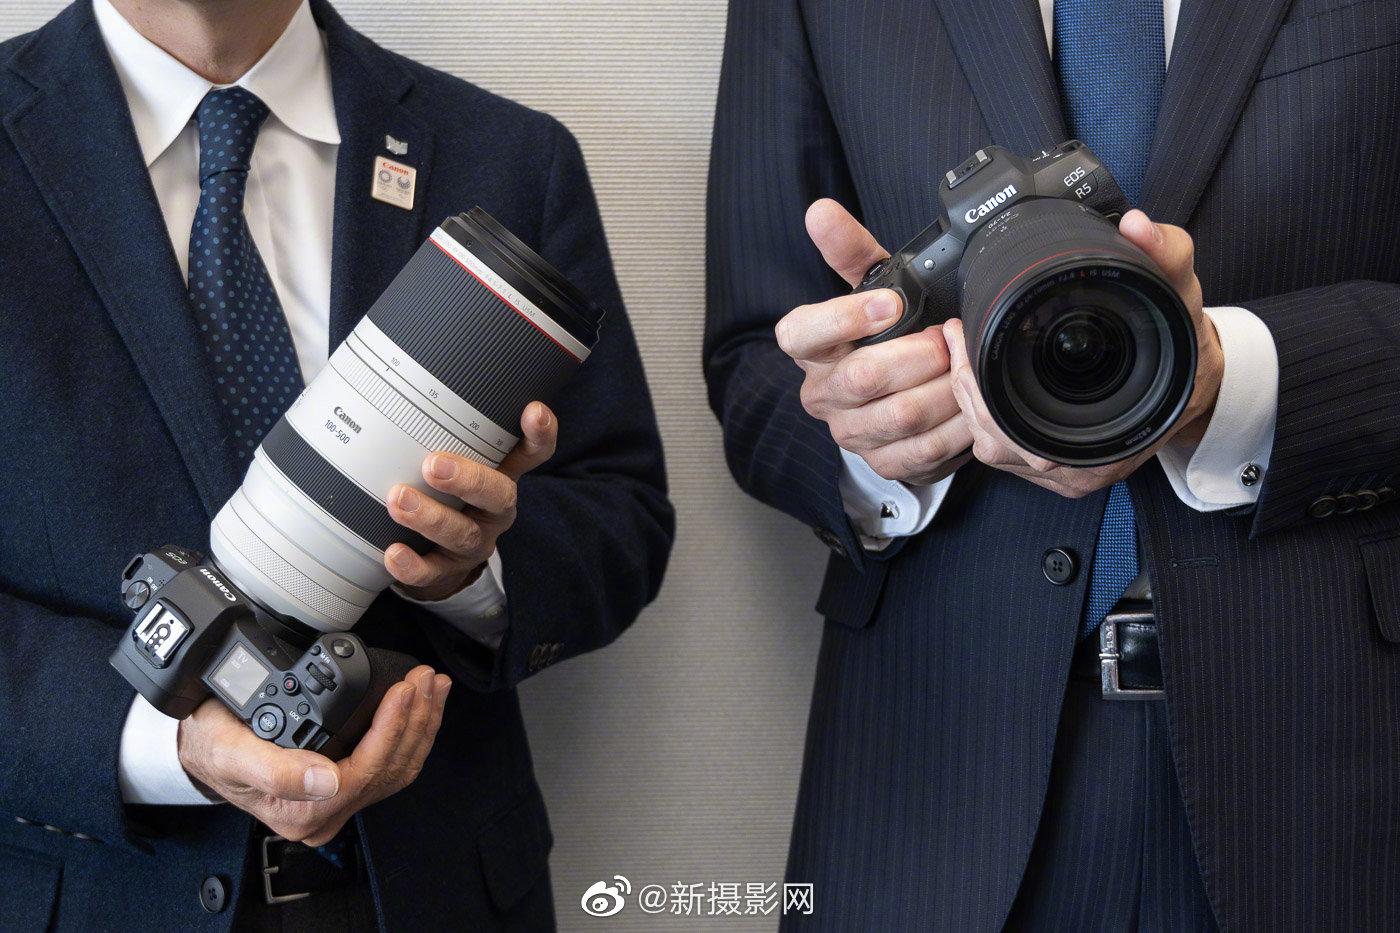 佳能EOS R5相机、RF 100-500mm F4.5-7.1 L IS USM镜头实拍图